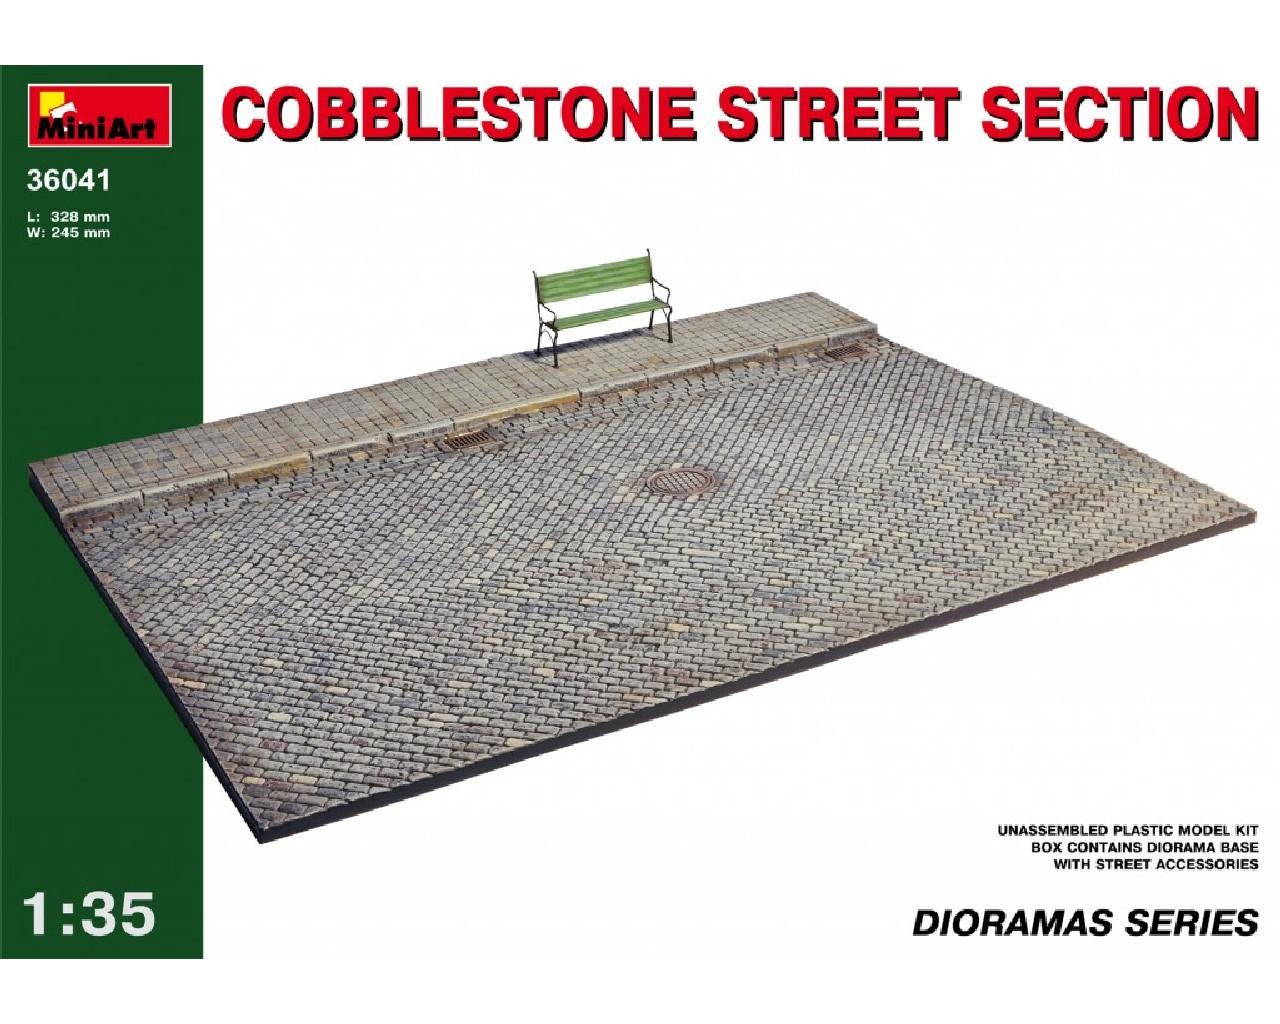 1/35 Cobblestone street section